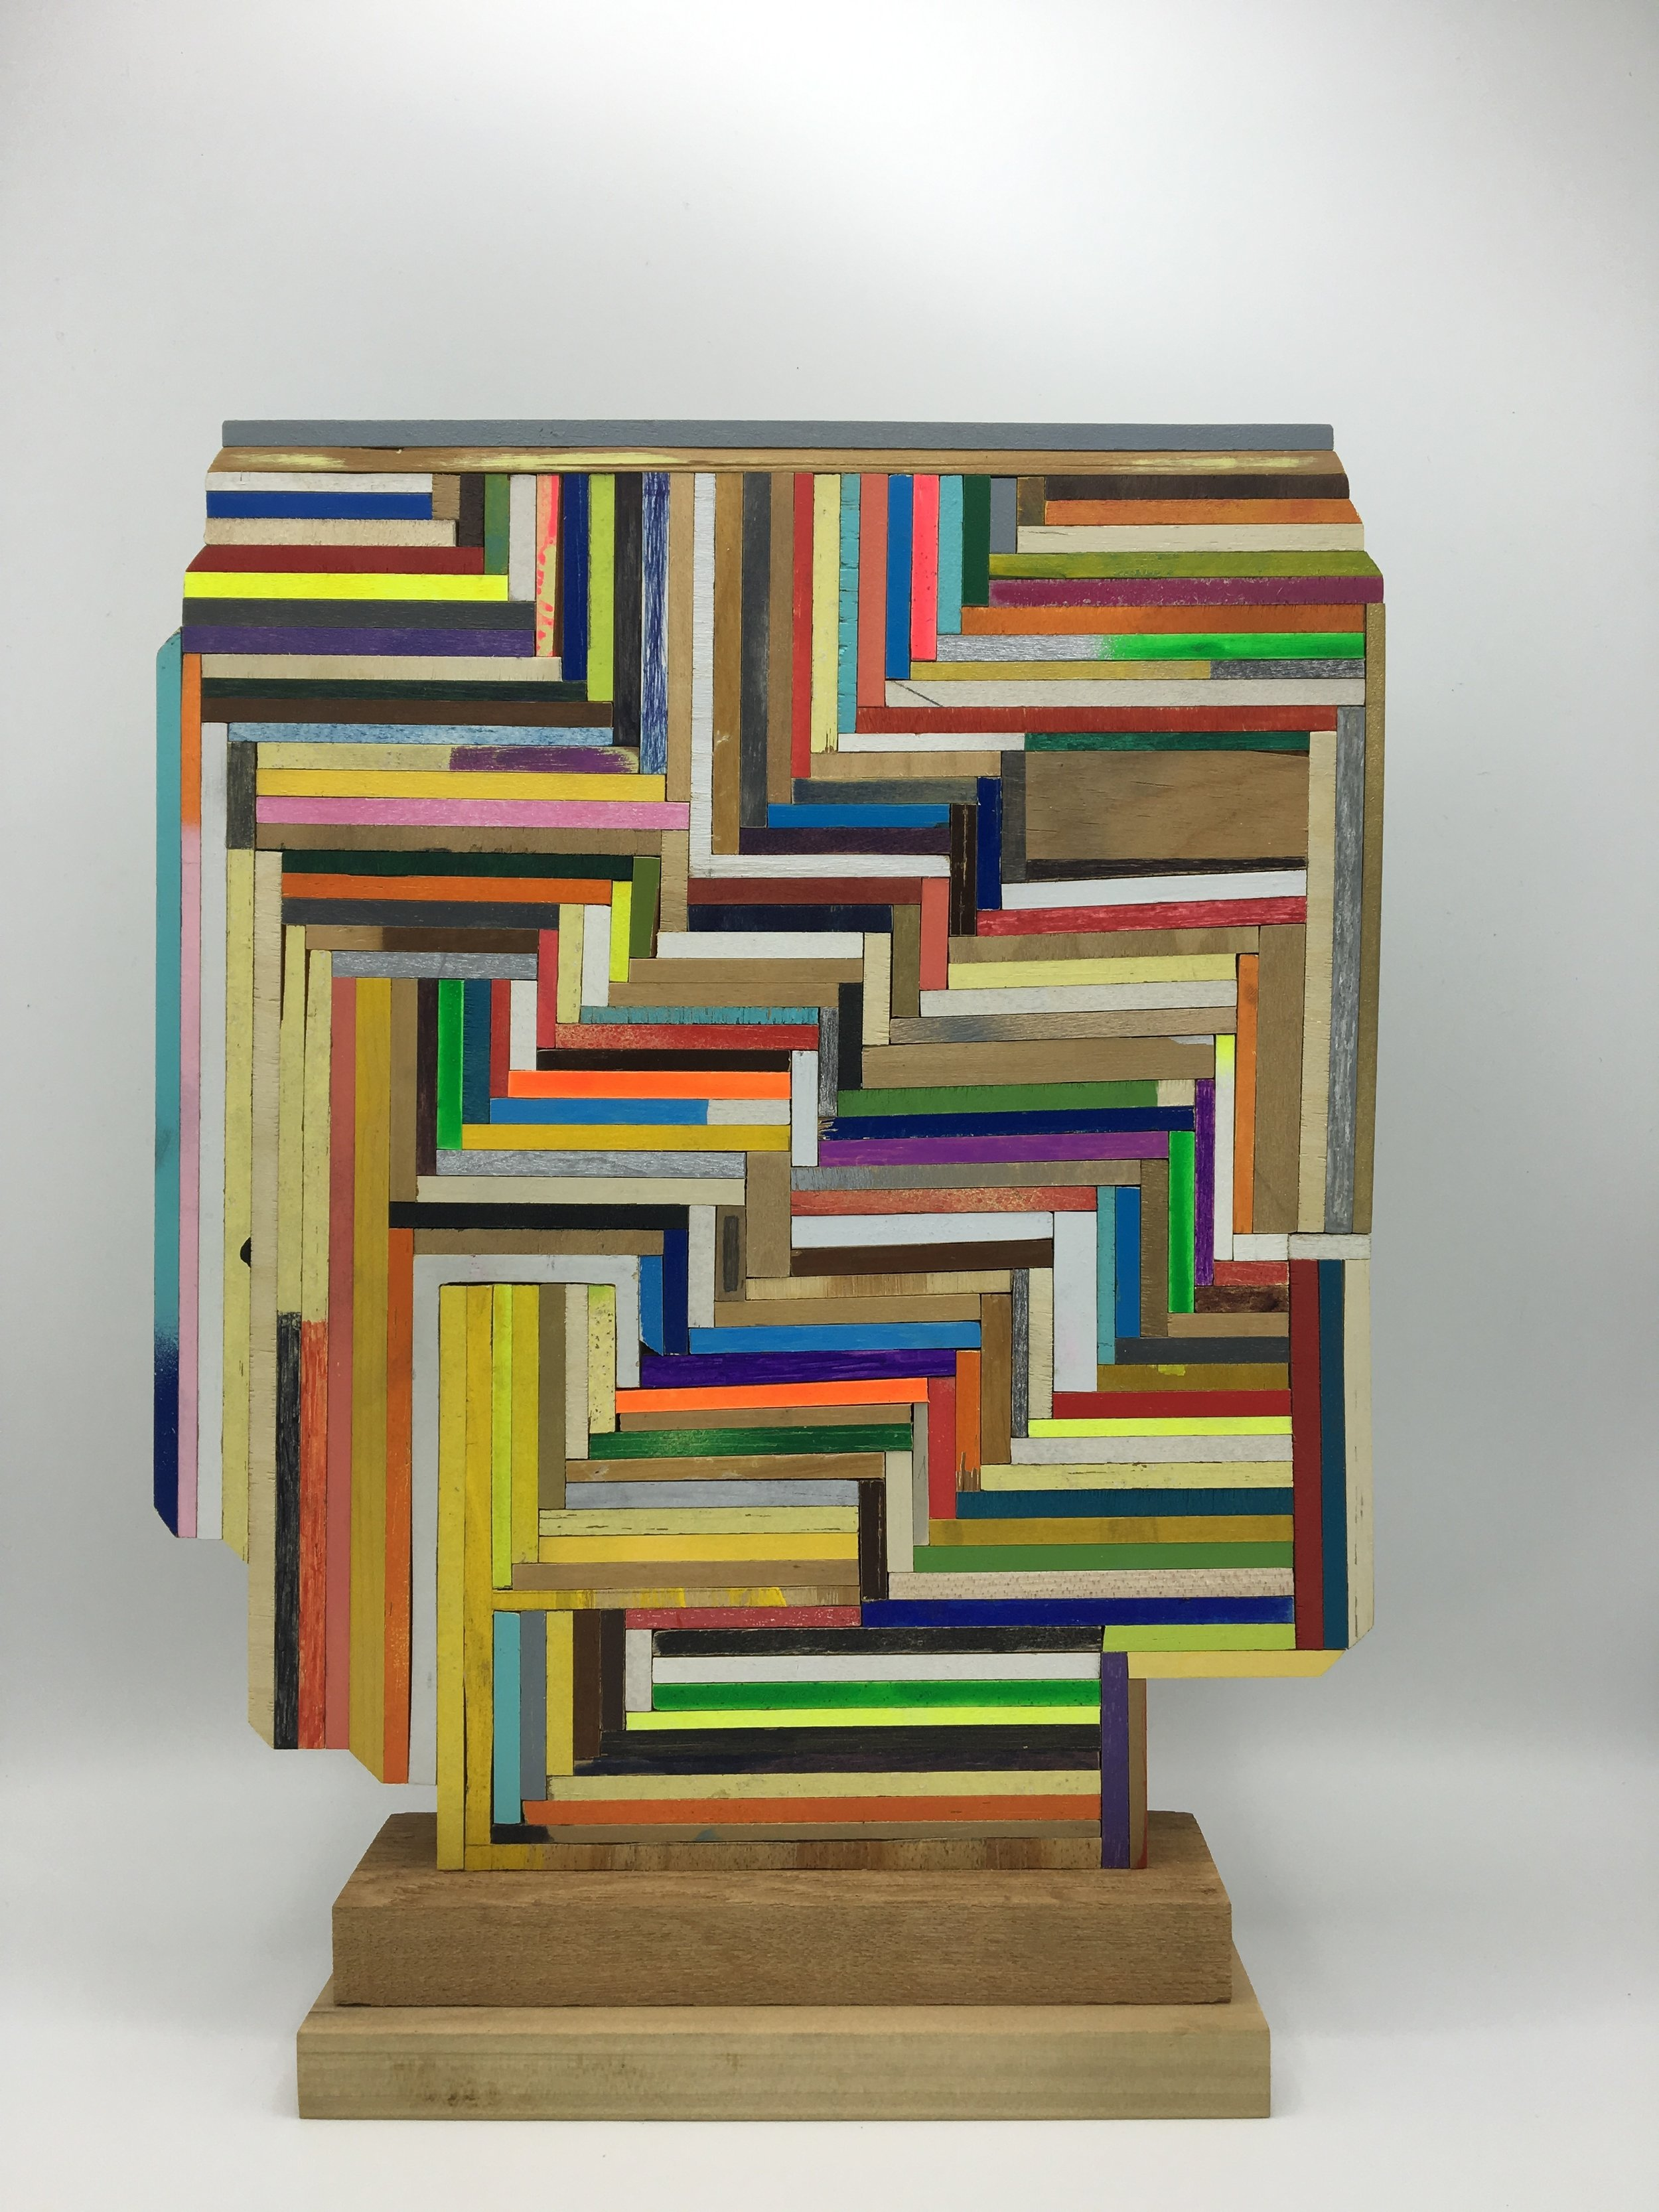 Damien Hoar de Galvan | Monument | 2016 | Wood, Paint, Colored Pencil, Glue | 14 x 11 x 3 in.